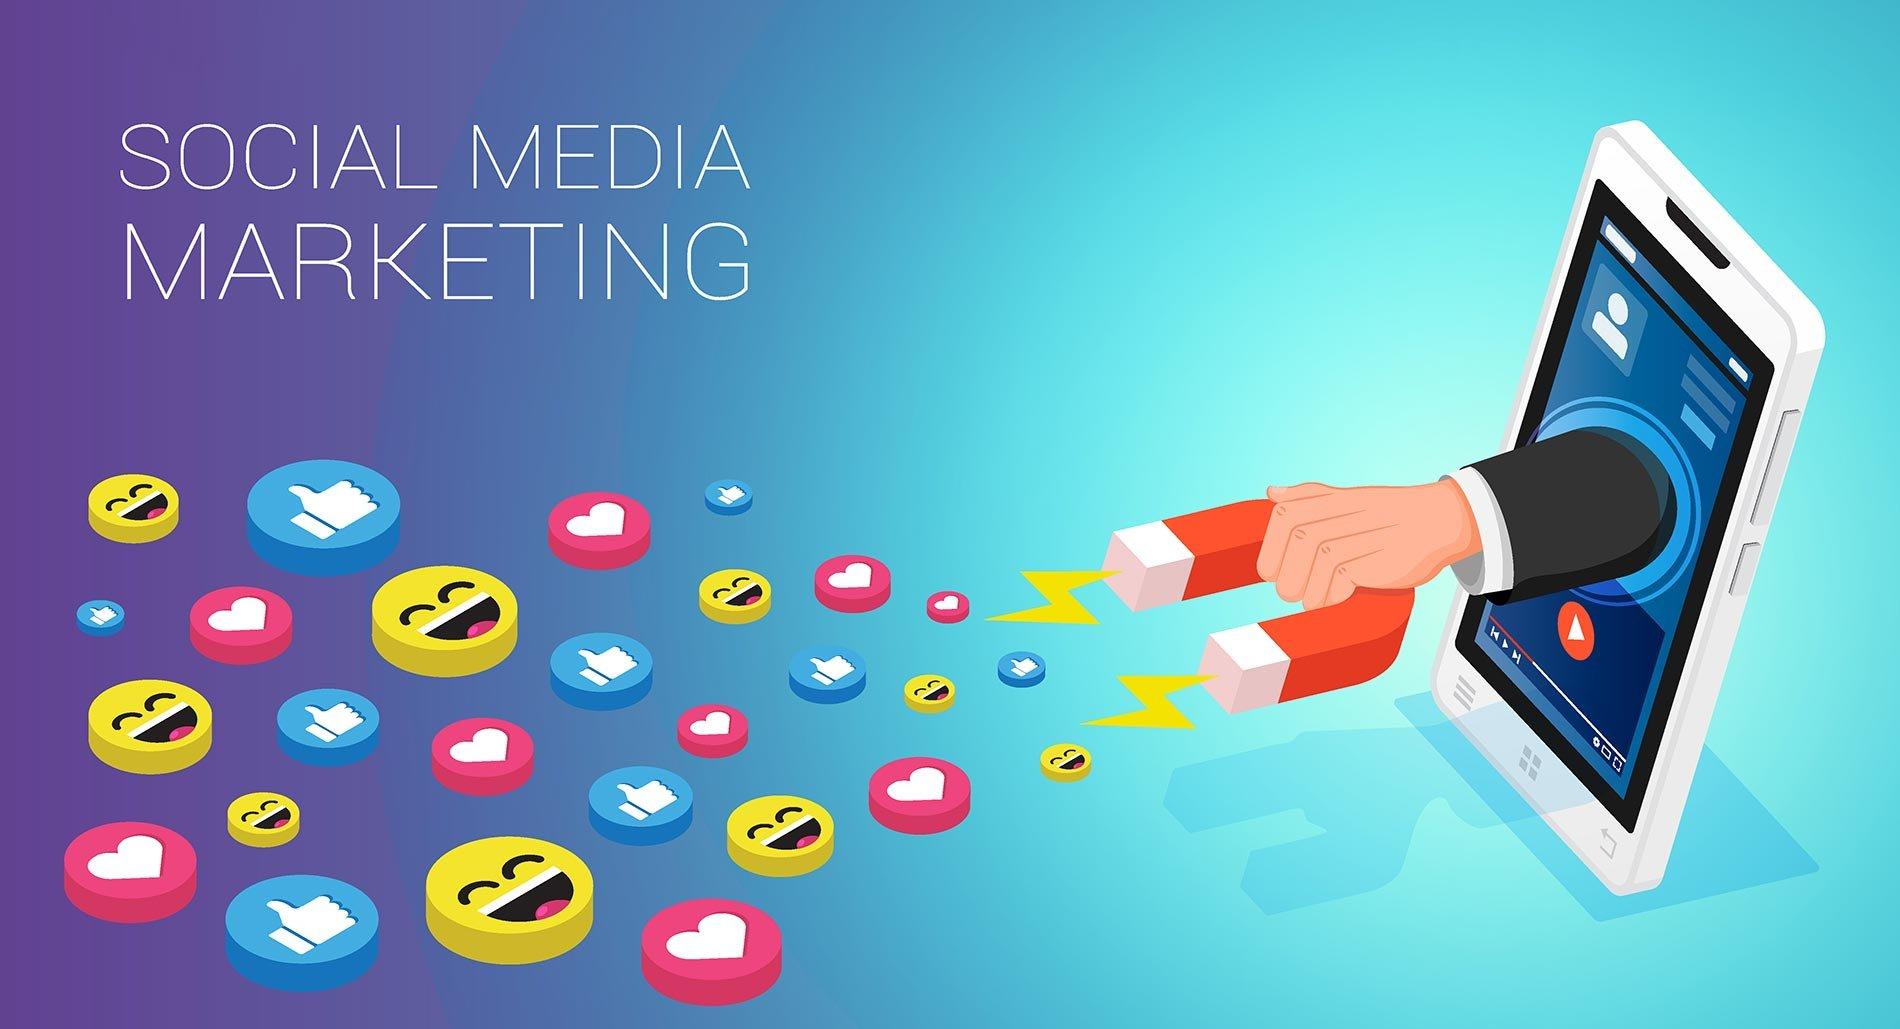 Generating leads through social media marketing